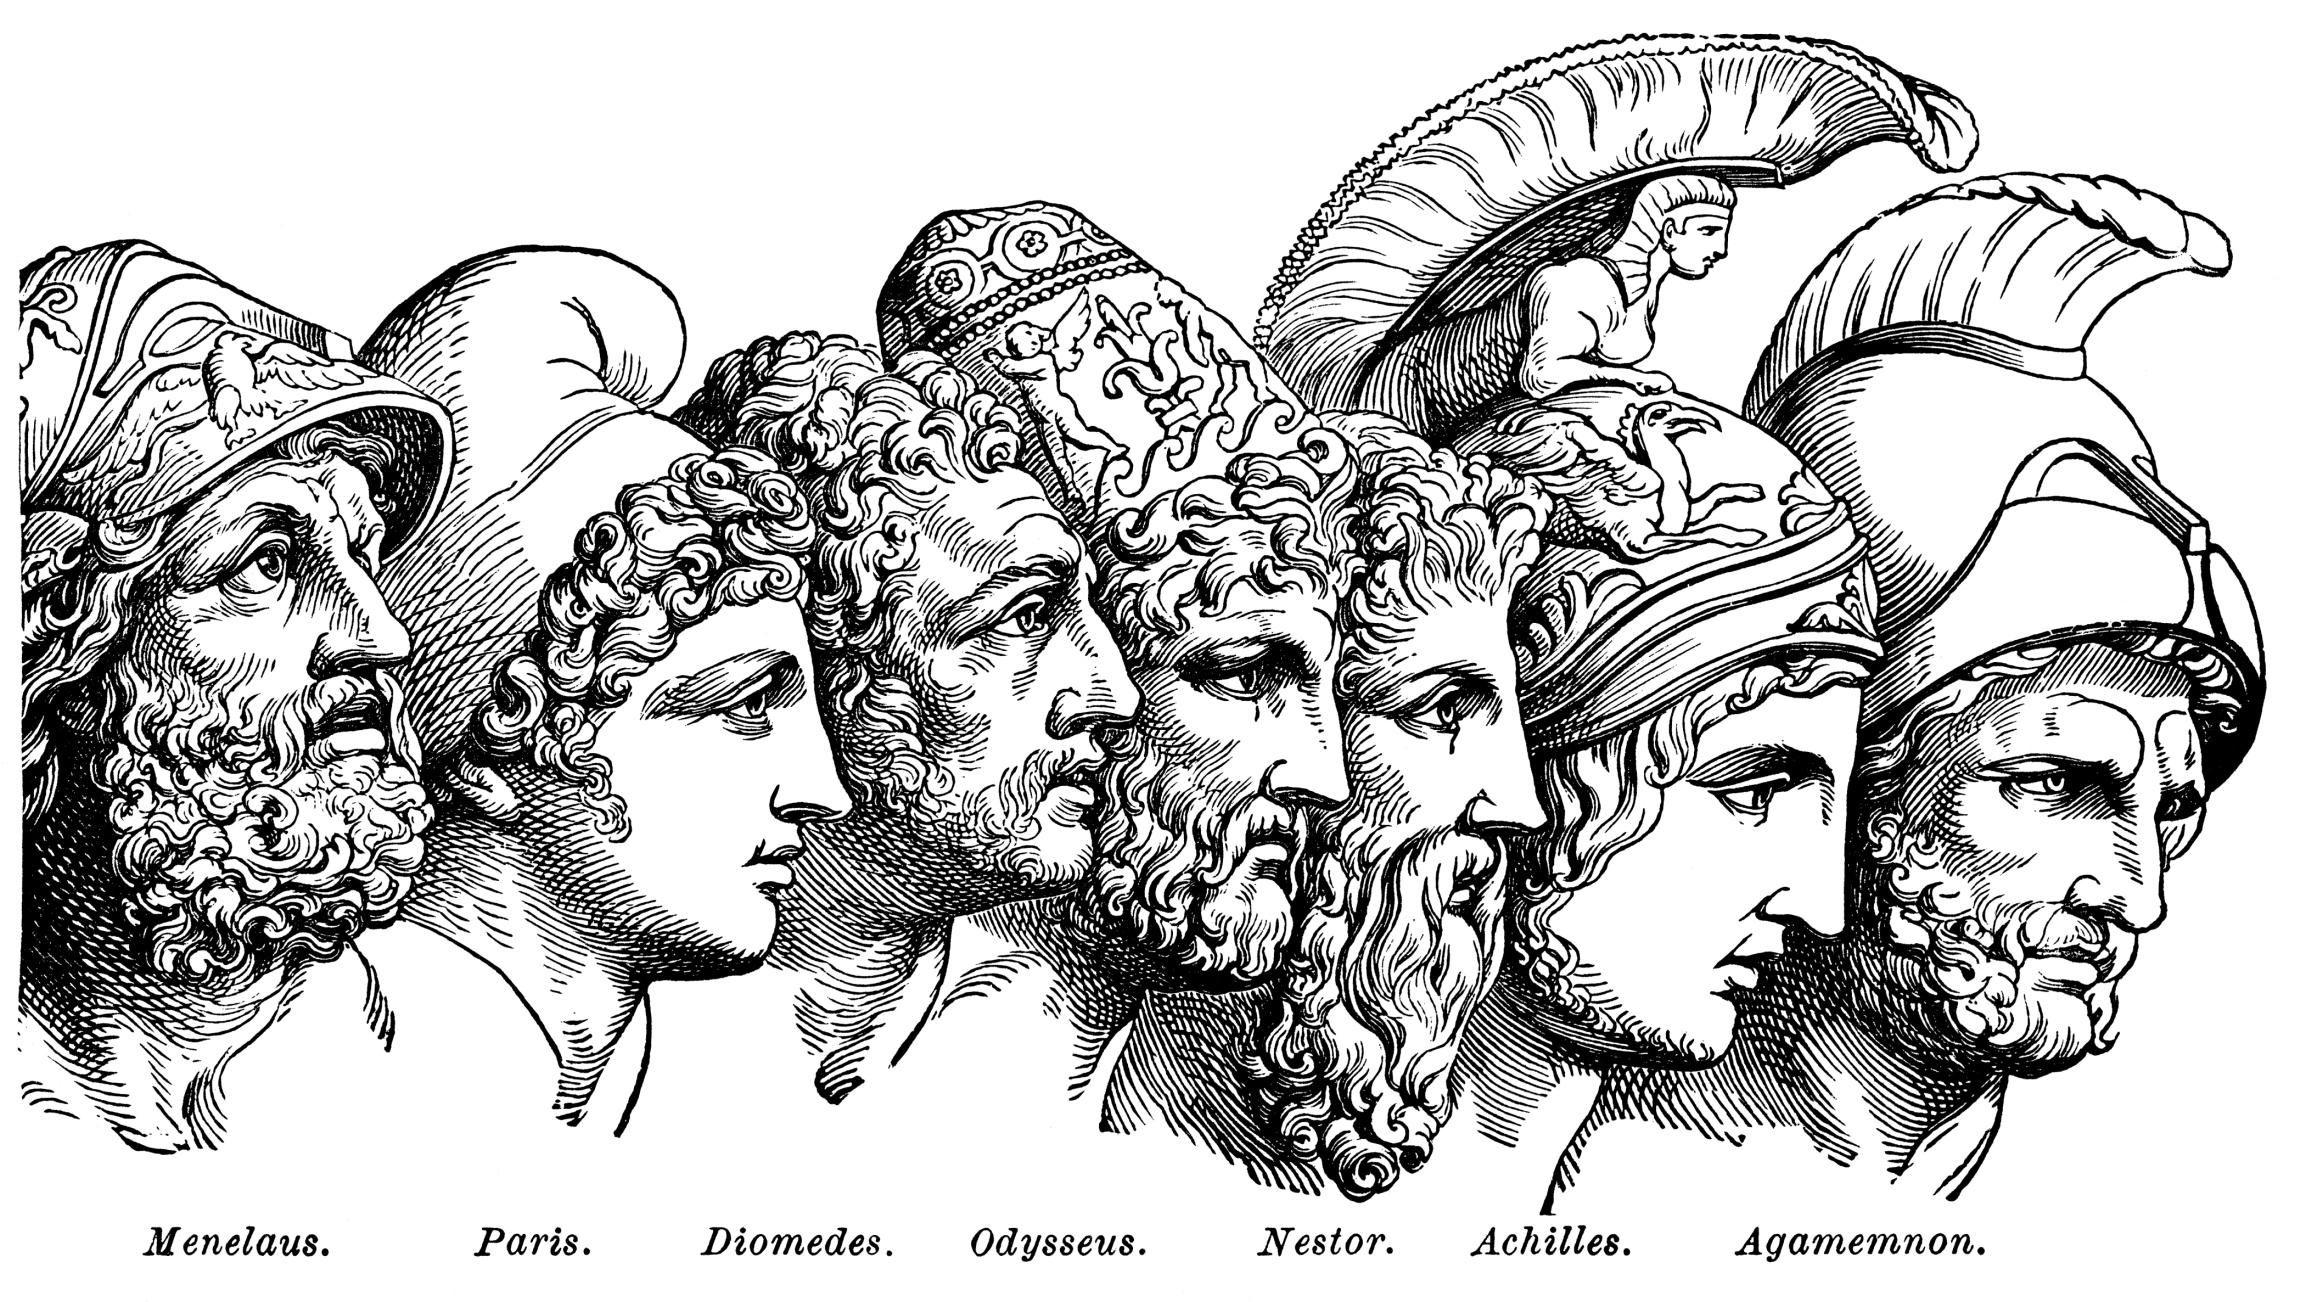 Era by Era Timeline of Ancient